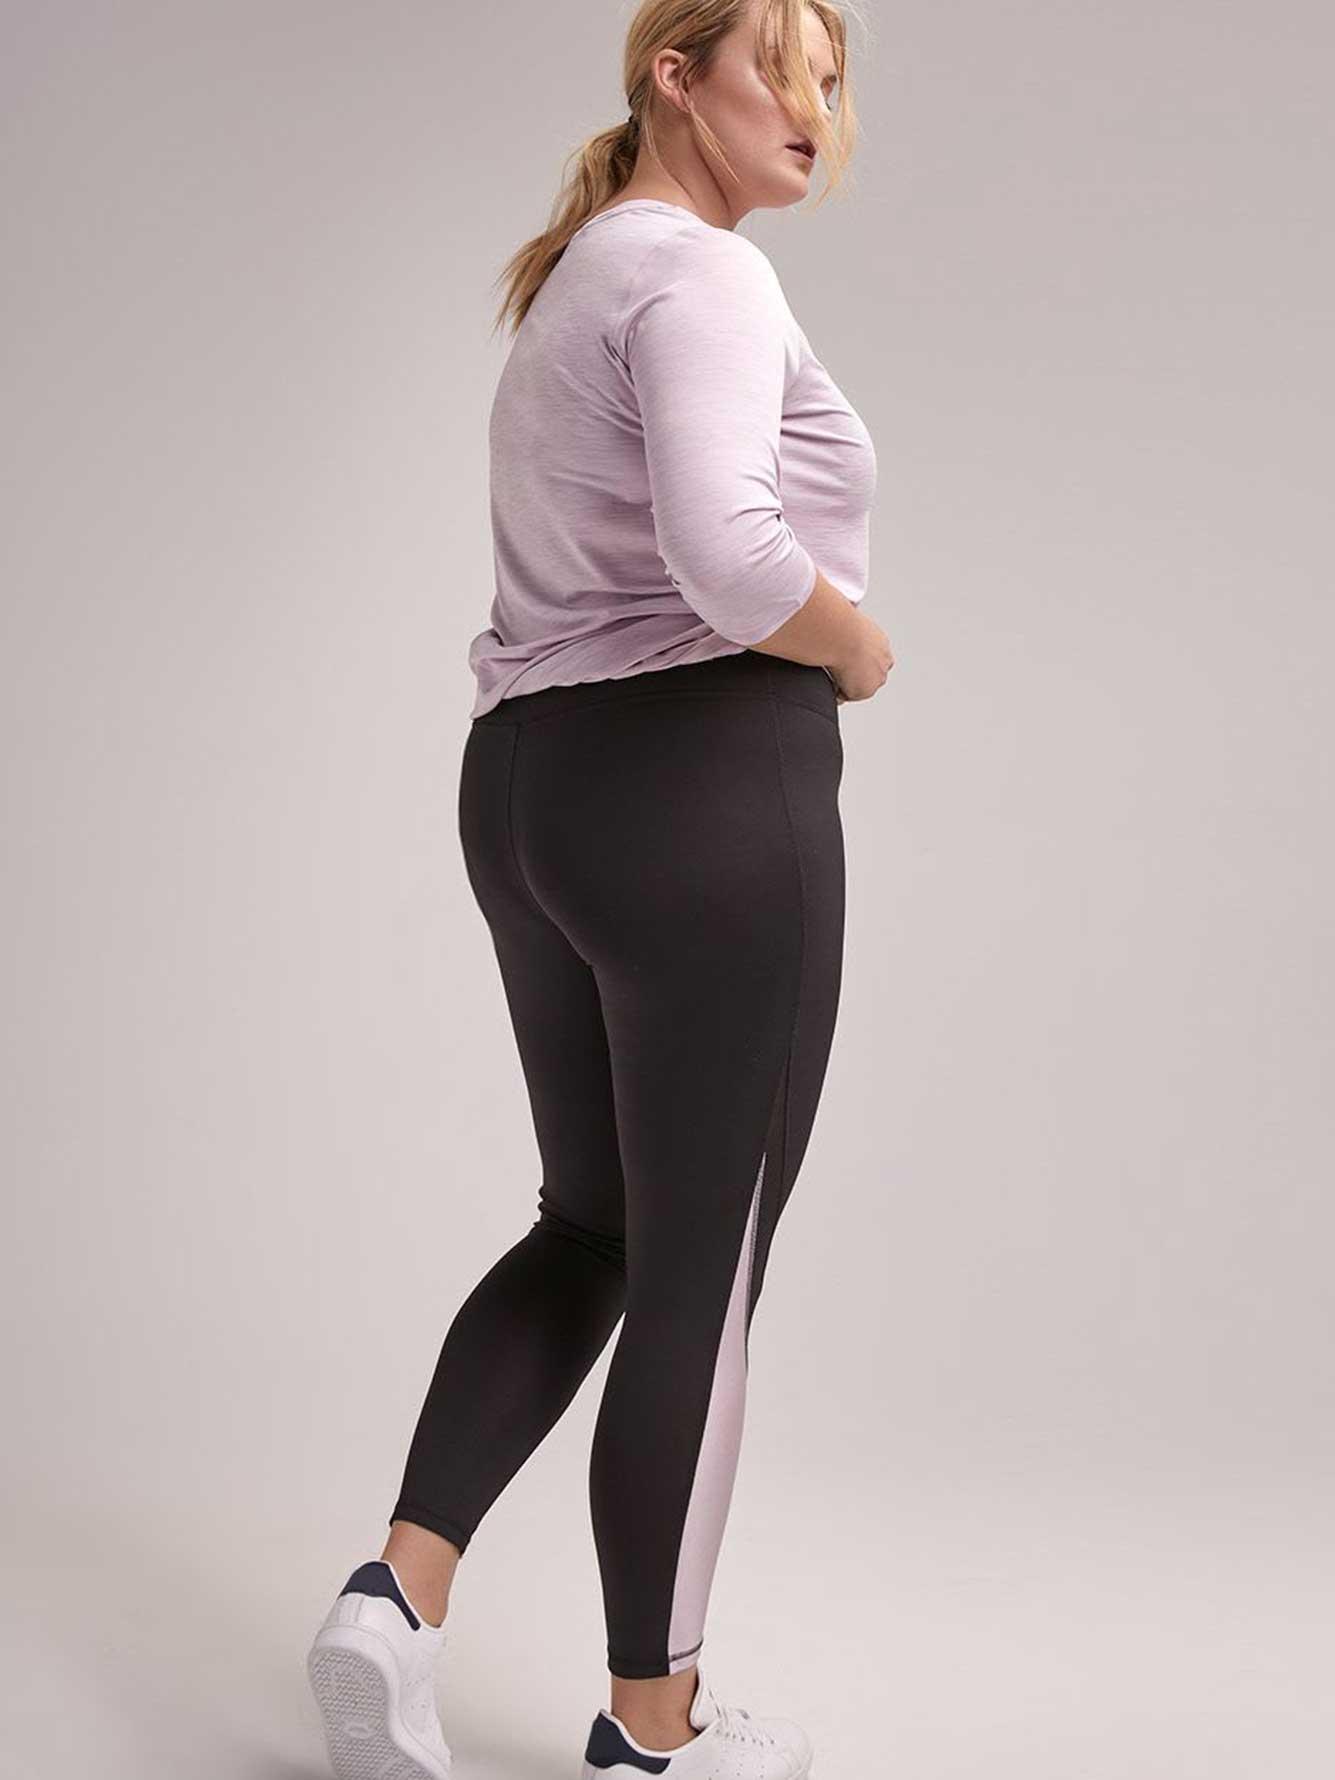 07c02b1537c41 Glossy Combo Legging - Nola | Addition Elle